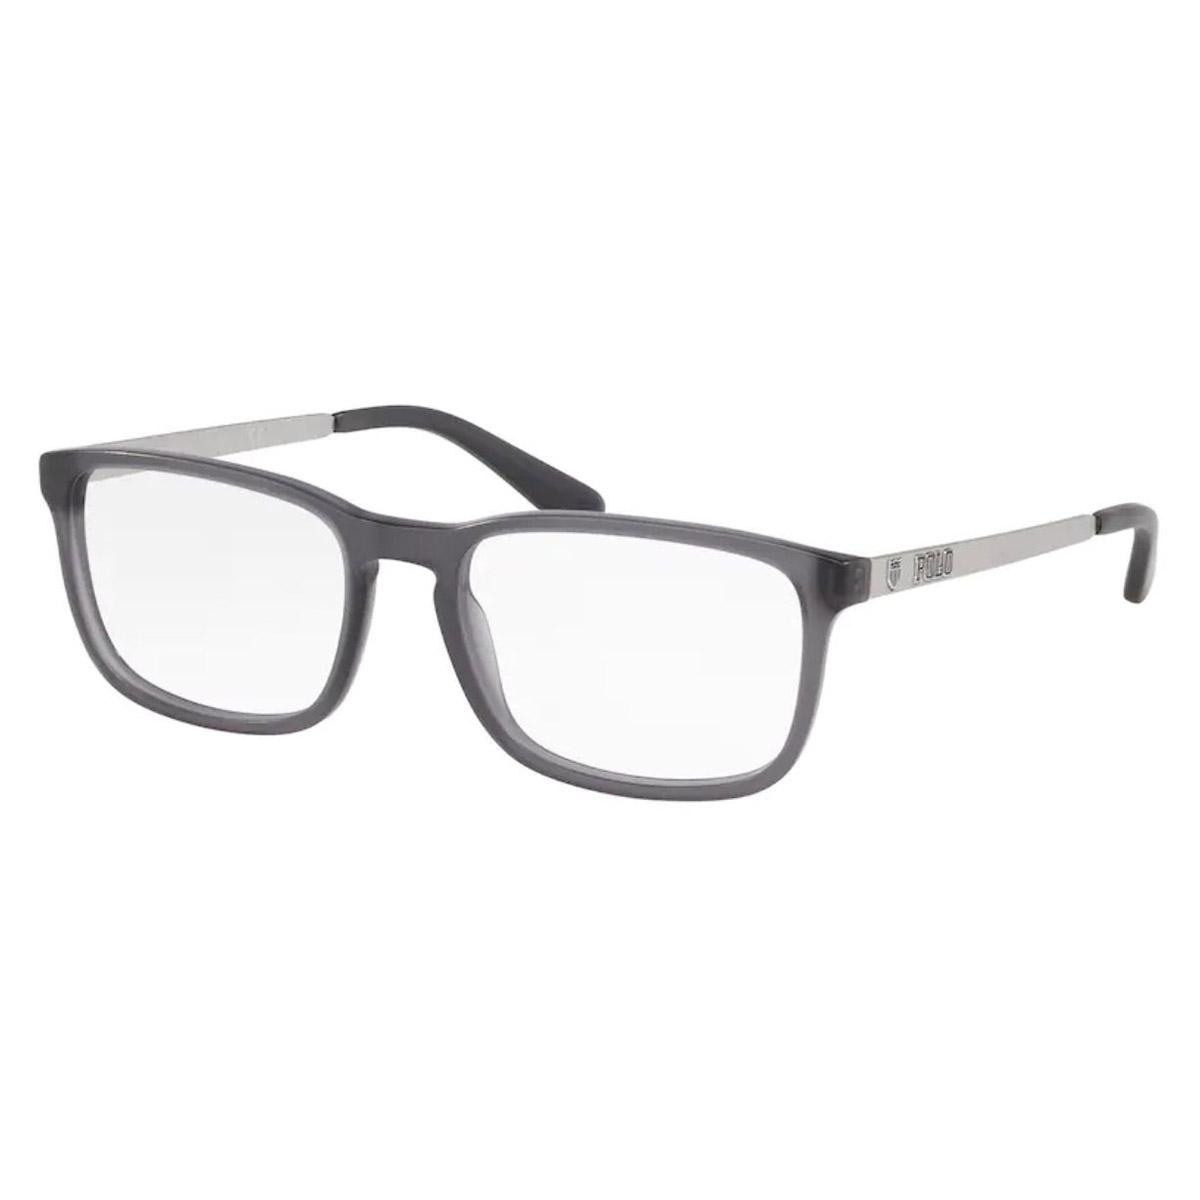 Armação de Óculos Polo Ralph Lauren PH2202 Cinza Fosco